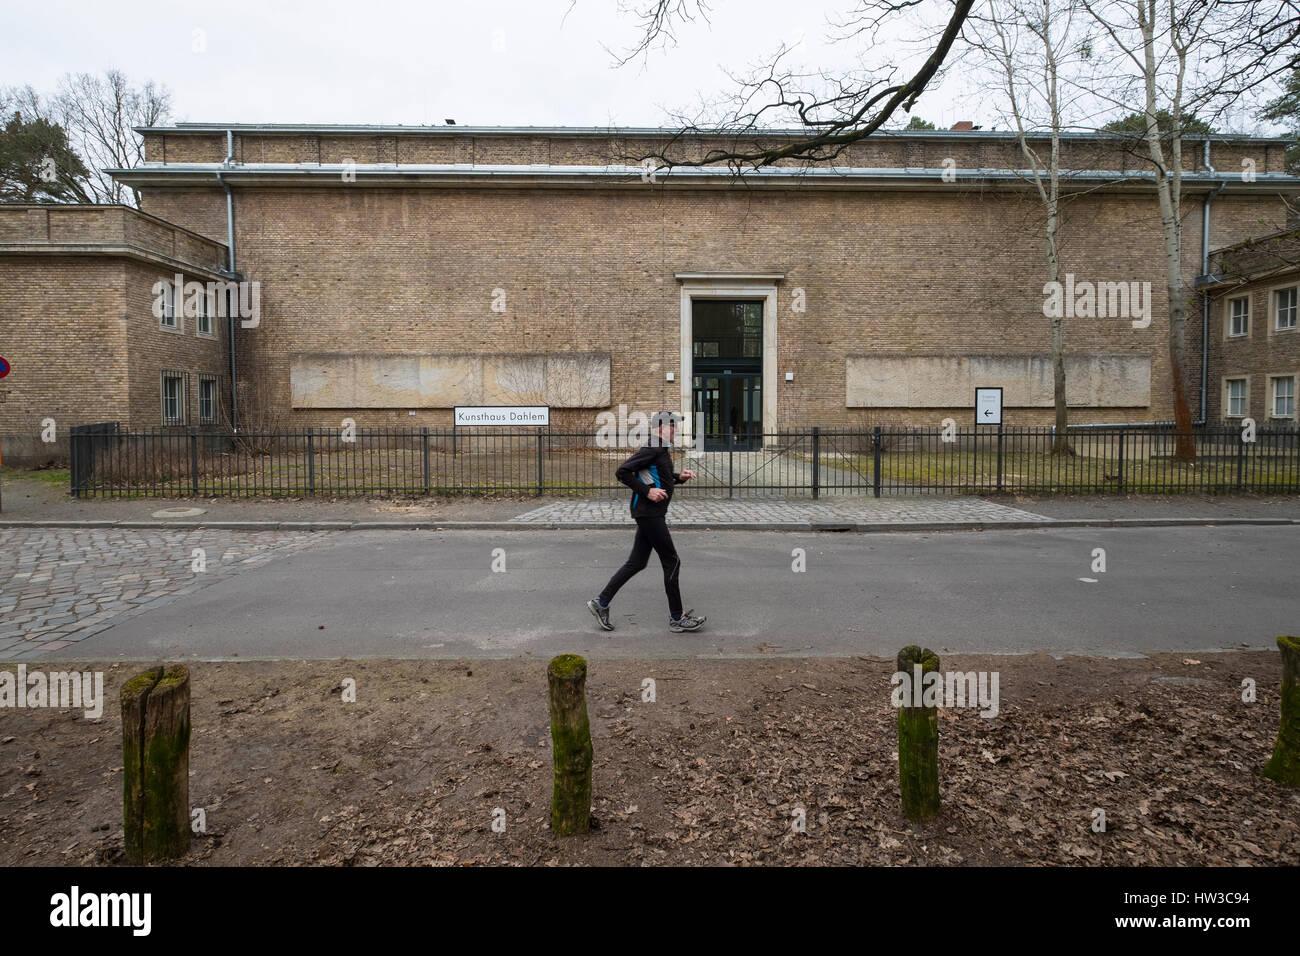 Kunsthaus Dahlem museum, an exhibition venue for postwar German modernism in Dahlem, Berlin , Germany - Stock Image